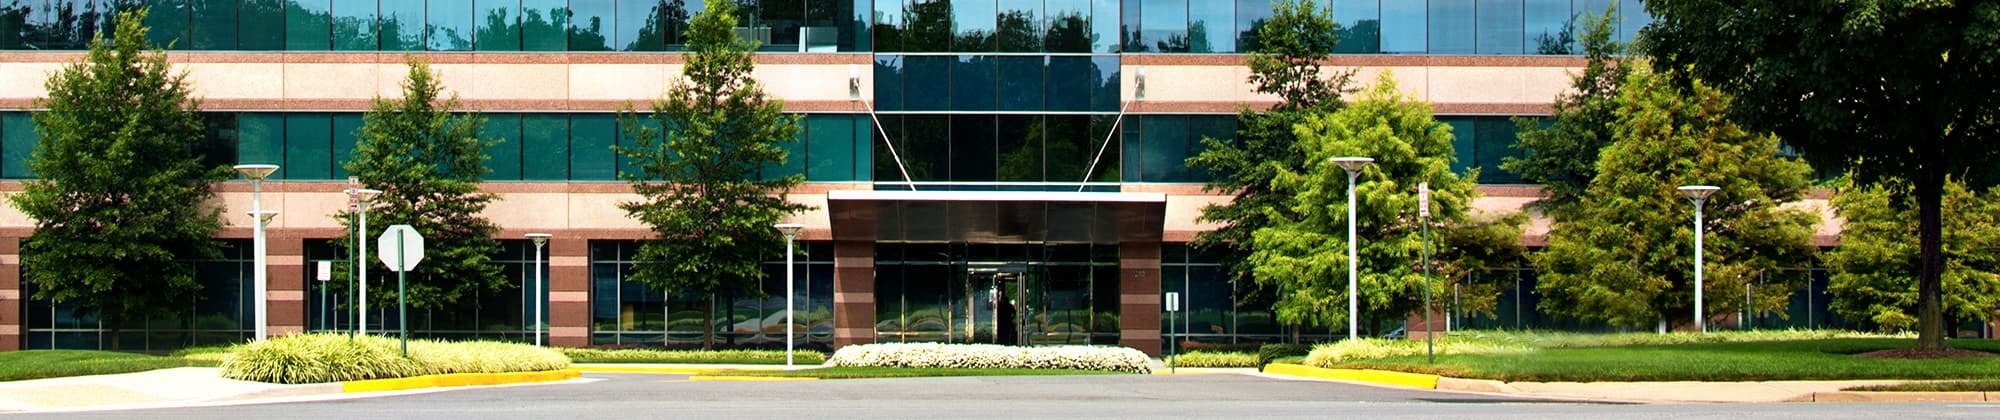 Personal Financial Management Advisors Dallas - Rawlings